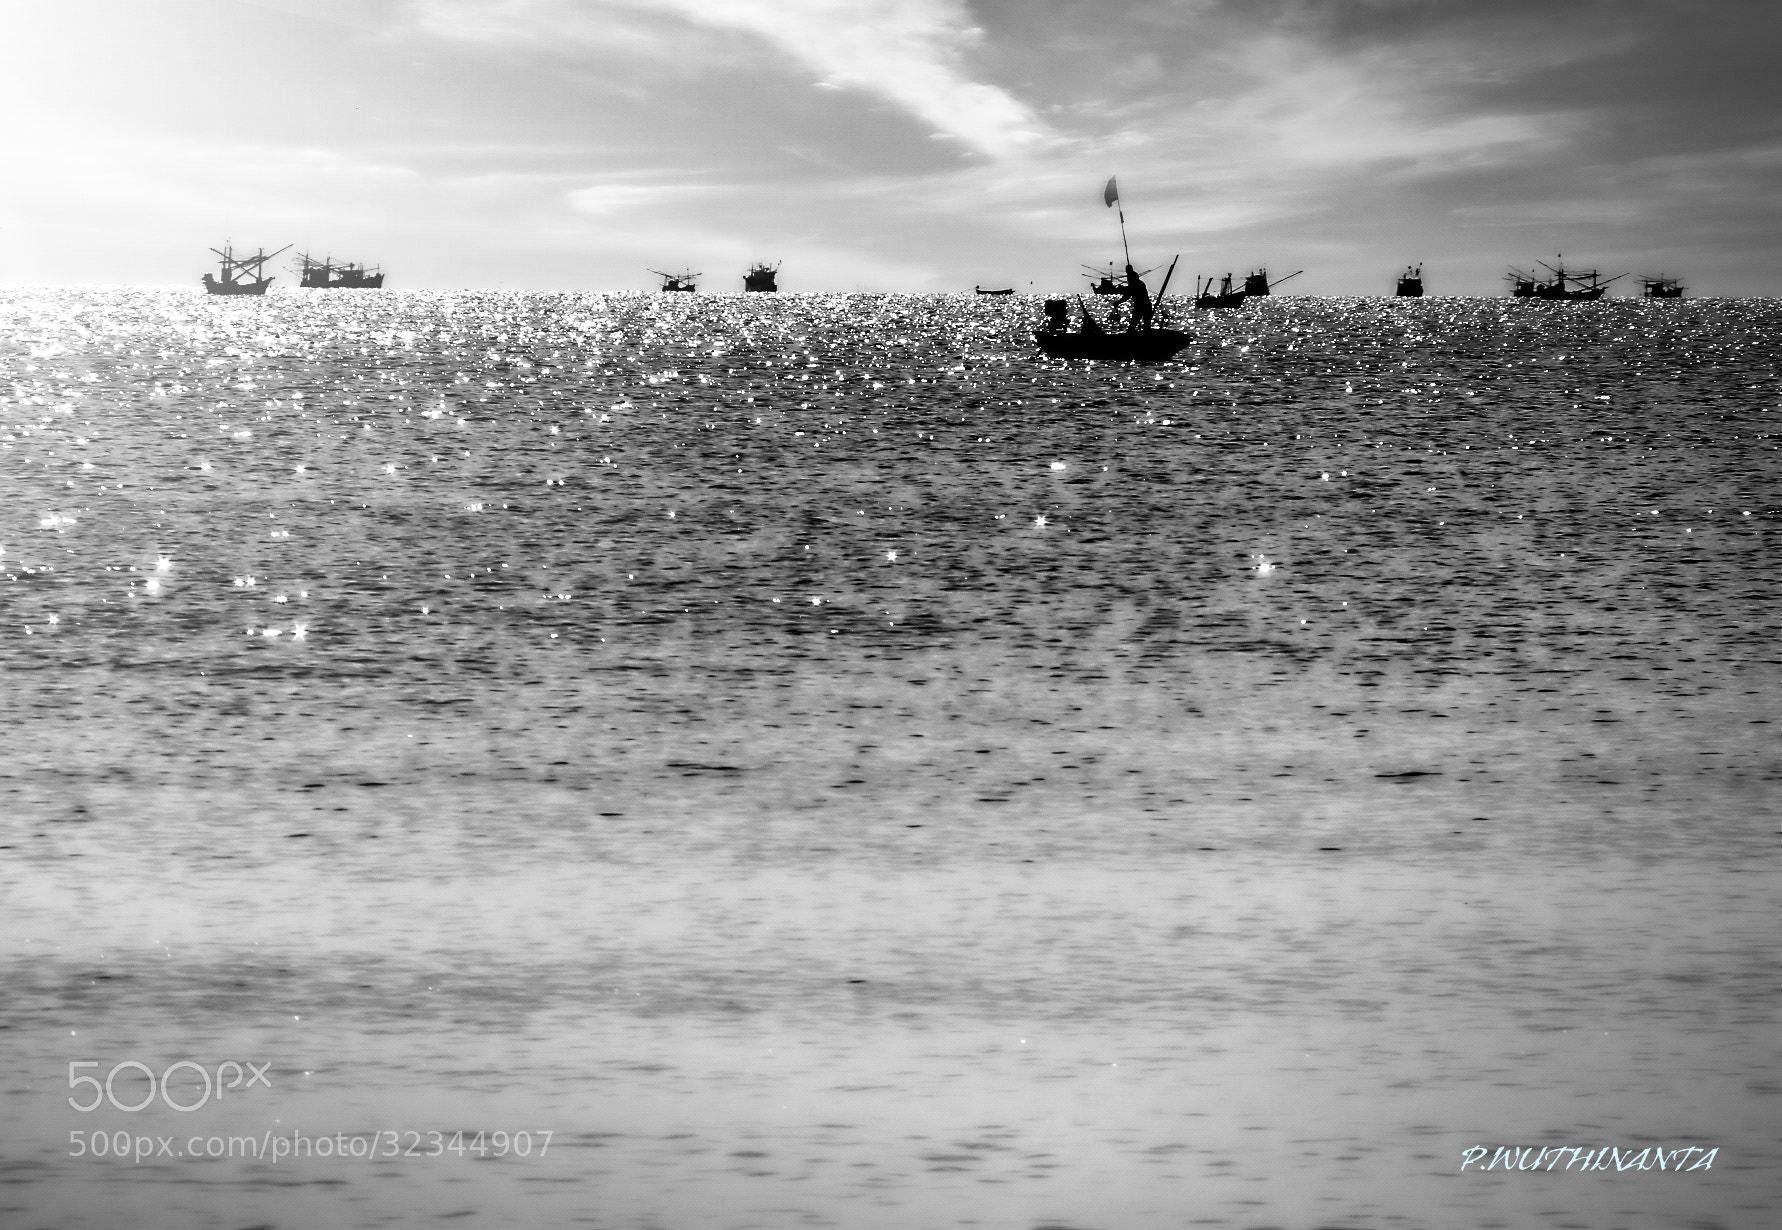 Photograph Fishermen is fishing. by Puthipong Wuthinanta on 500px